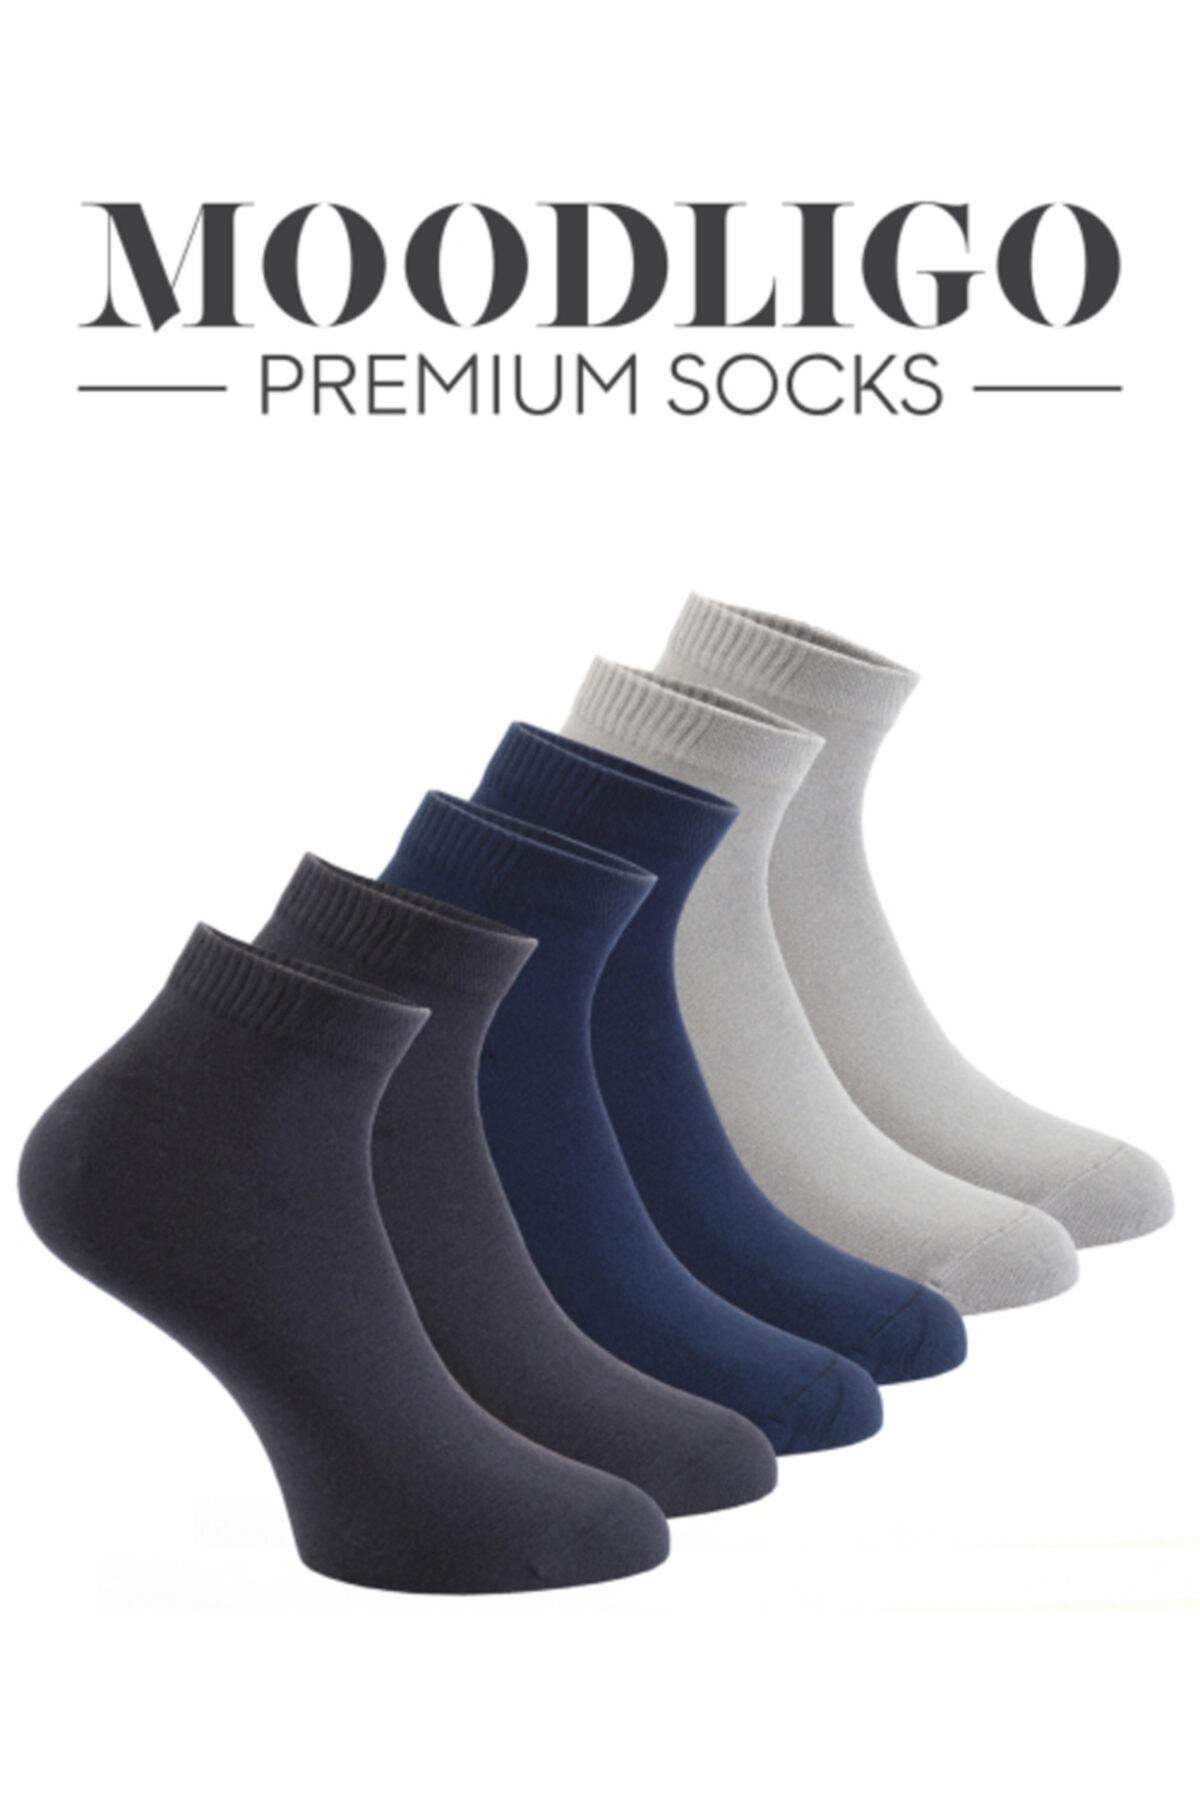 Moodligo Premium 6'lı Bambu Patik Erkek Çorap 2 Füme 2 Lacivert 2 Gri 2